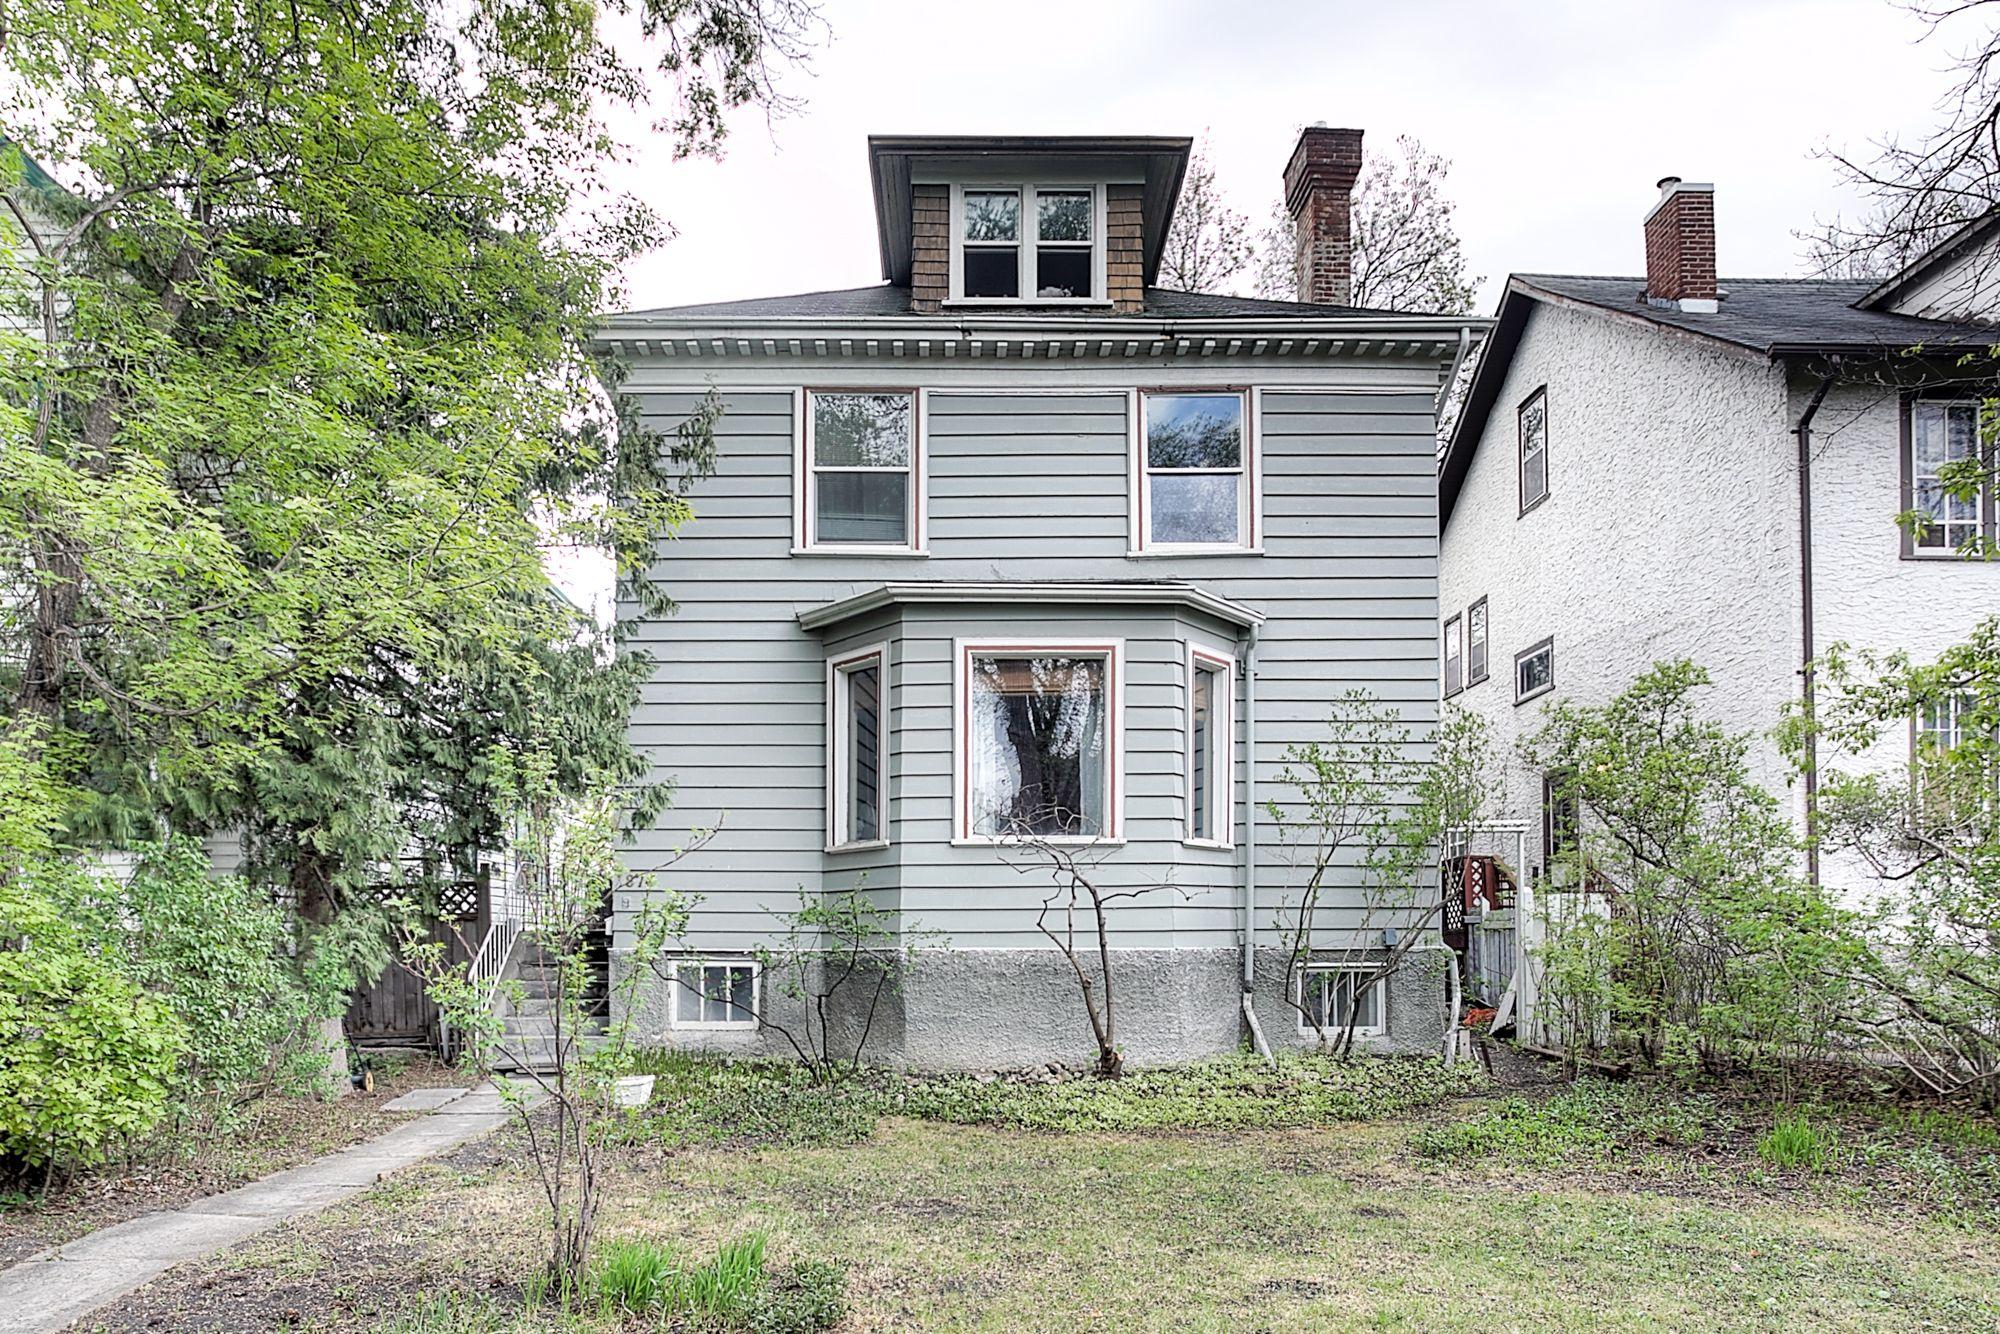 Main Photo: 874 Grosvenor Avenue in Winnipeg: Crescentwood Single Family Detached for sale (1B)  : MLS®# 1813359